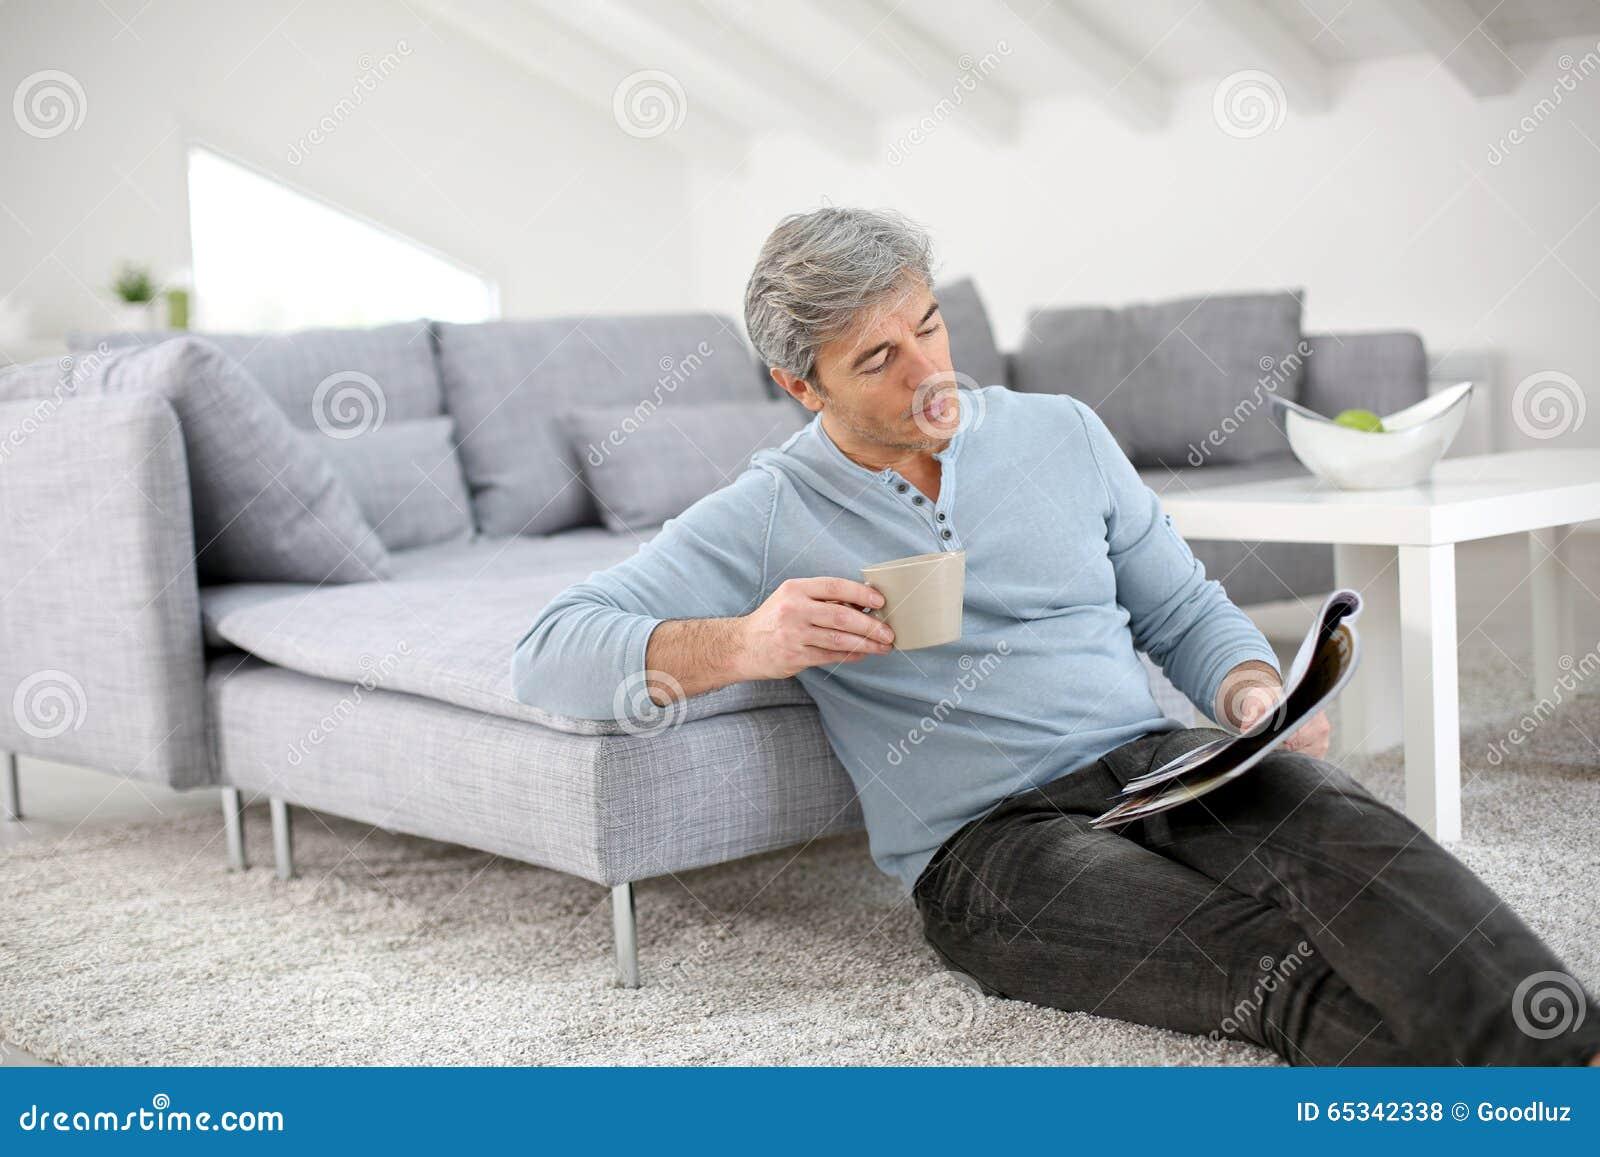 Senior man relaxing at home reading magazine